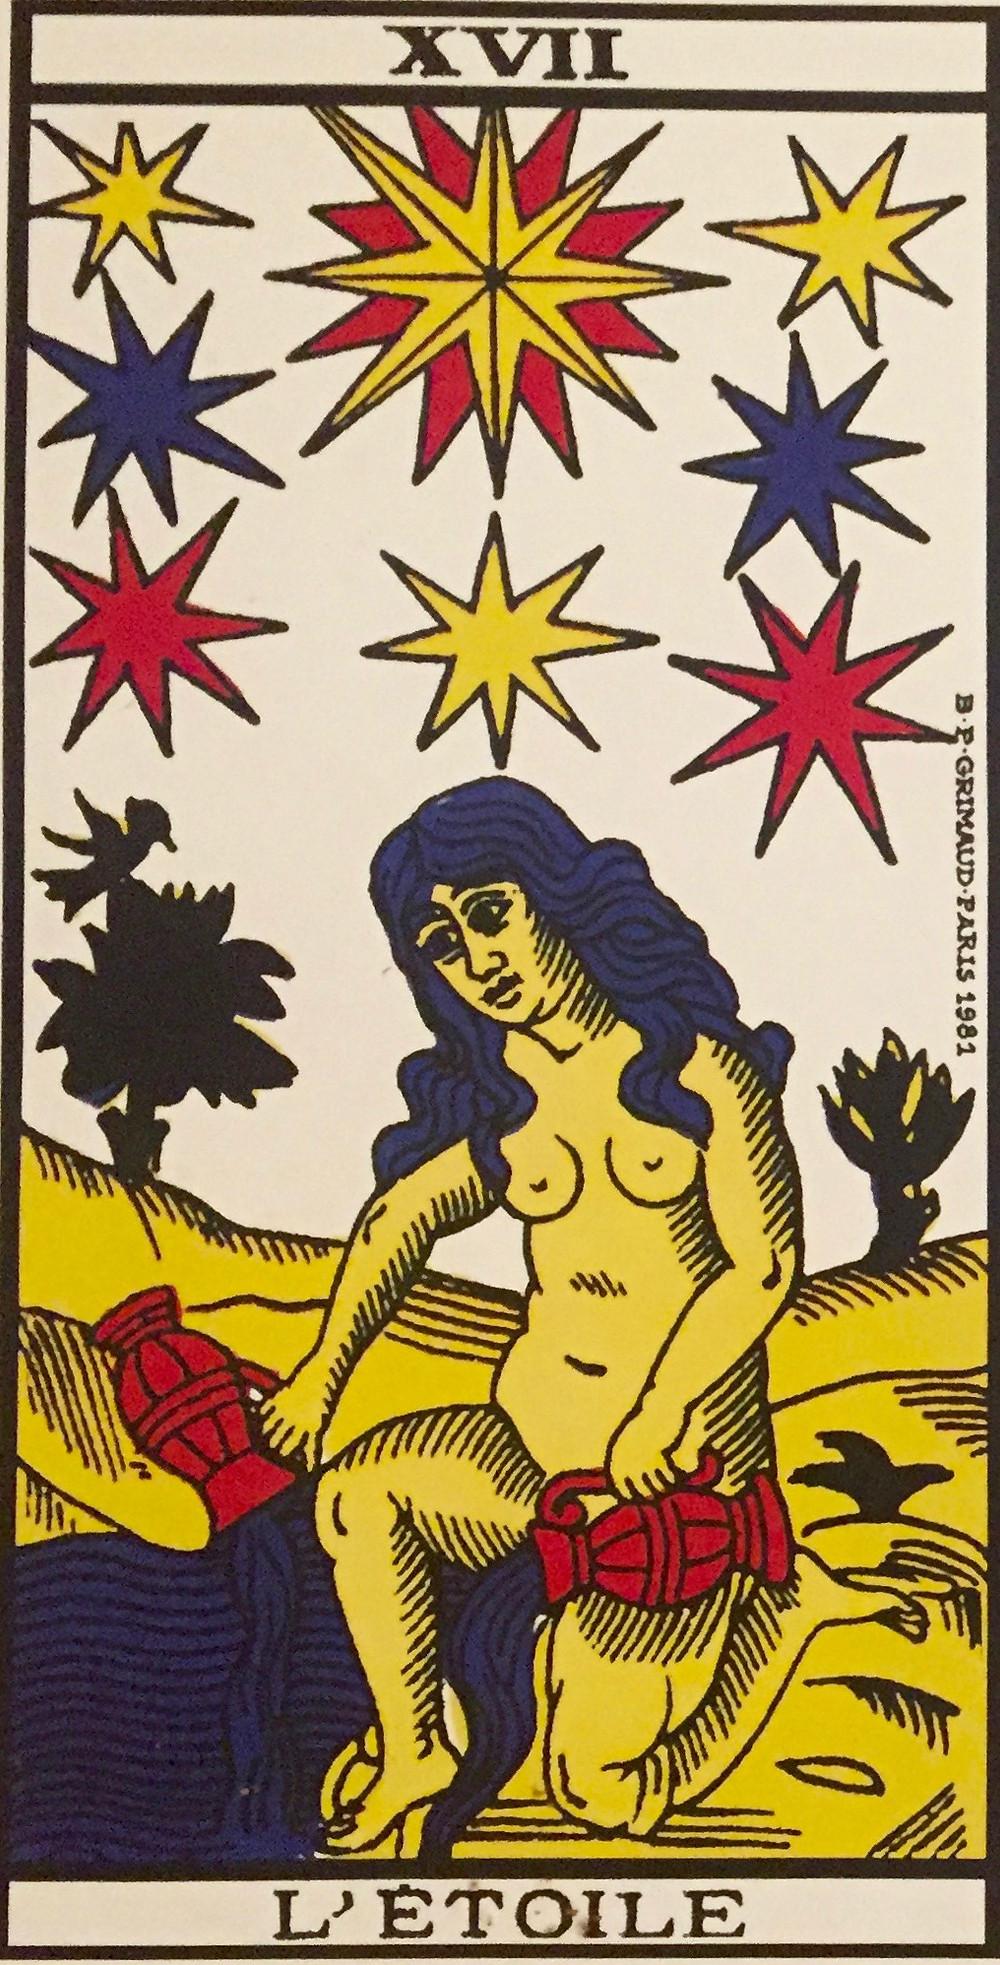 L'Etoile Tarot de Marseilles